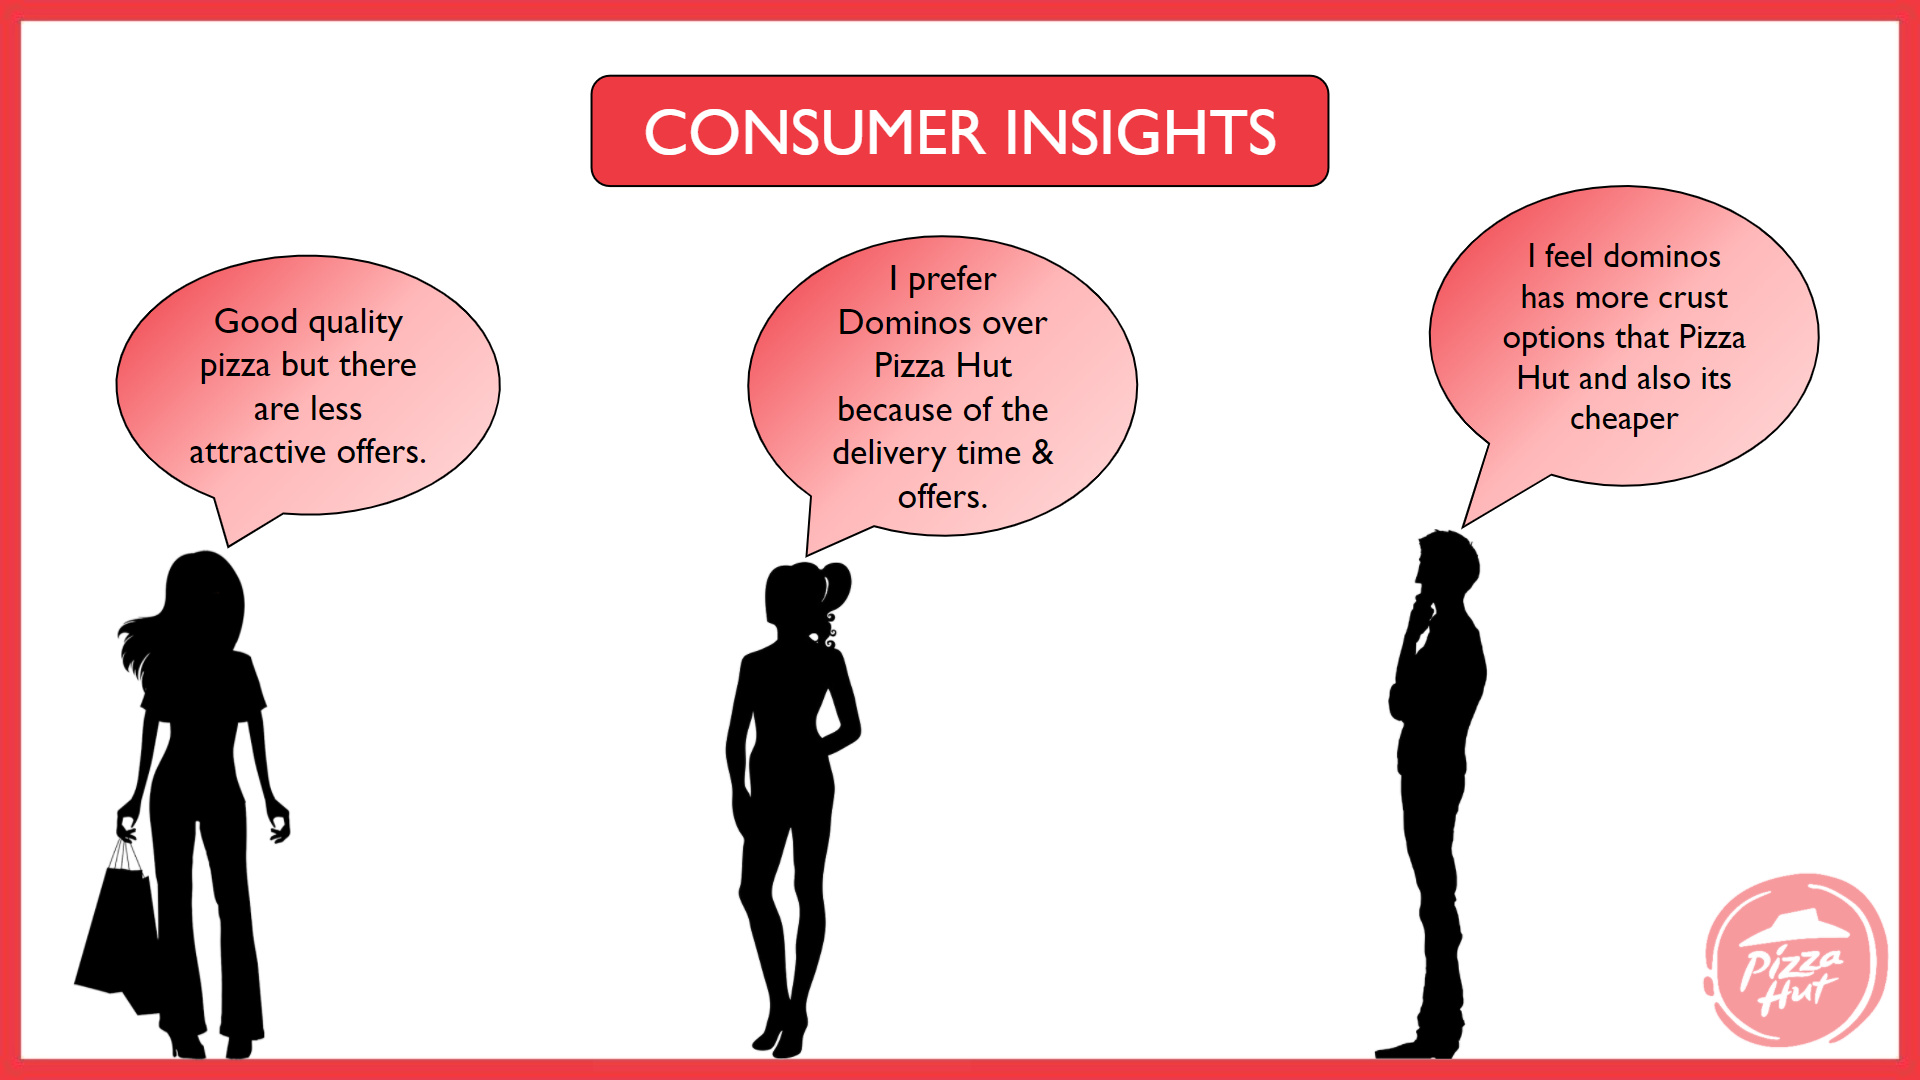 pizza hut marketing strategy Consumer Insights - Pizza Hut Marketing and Advertising Strategy